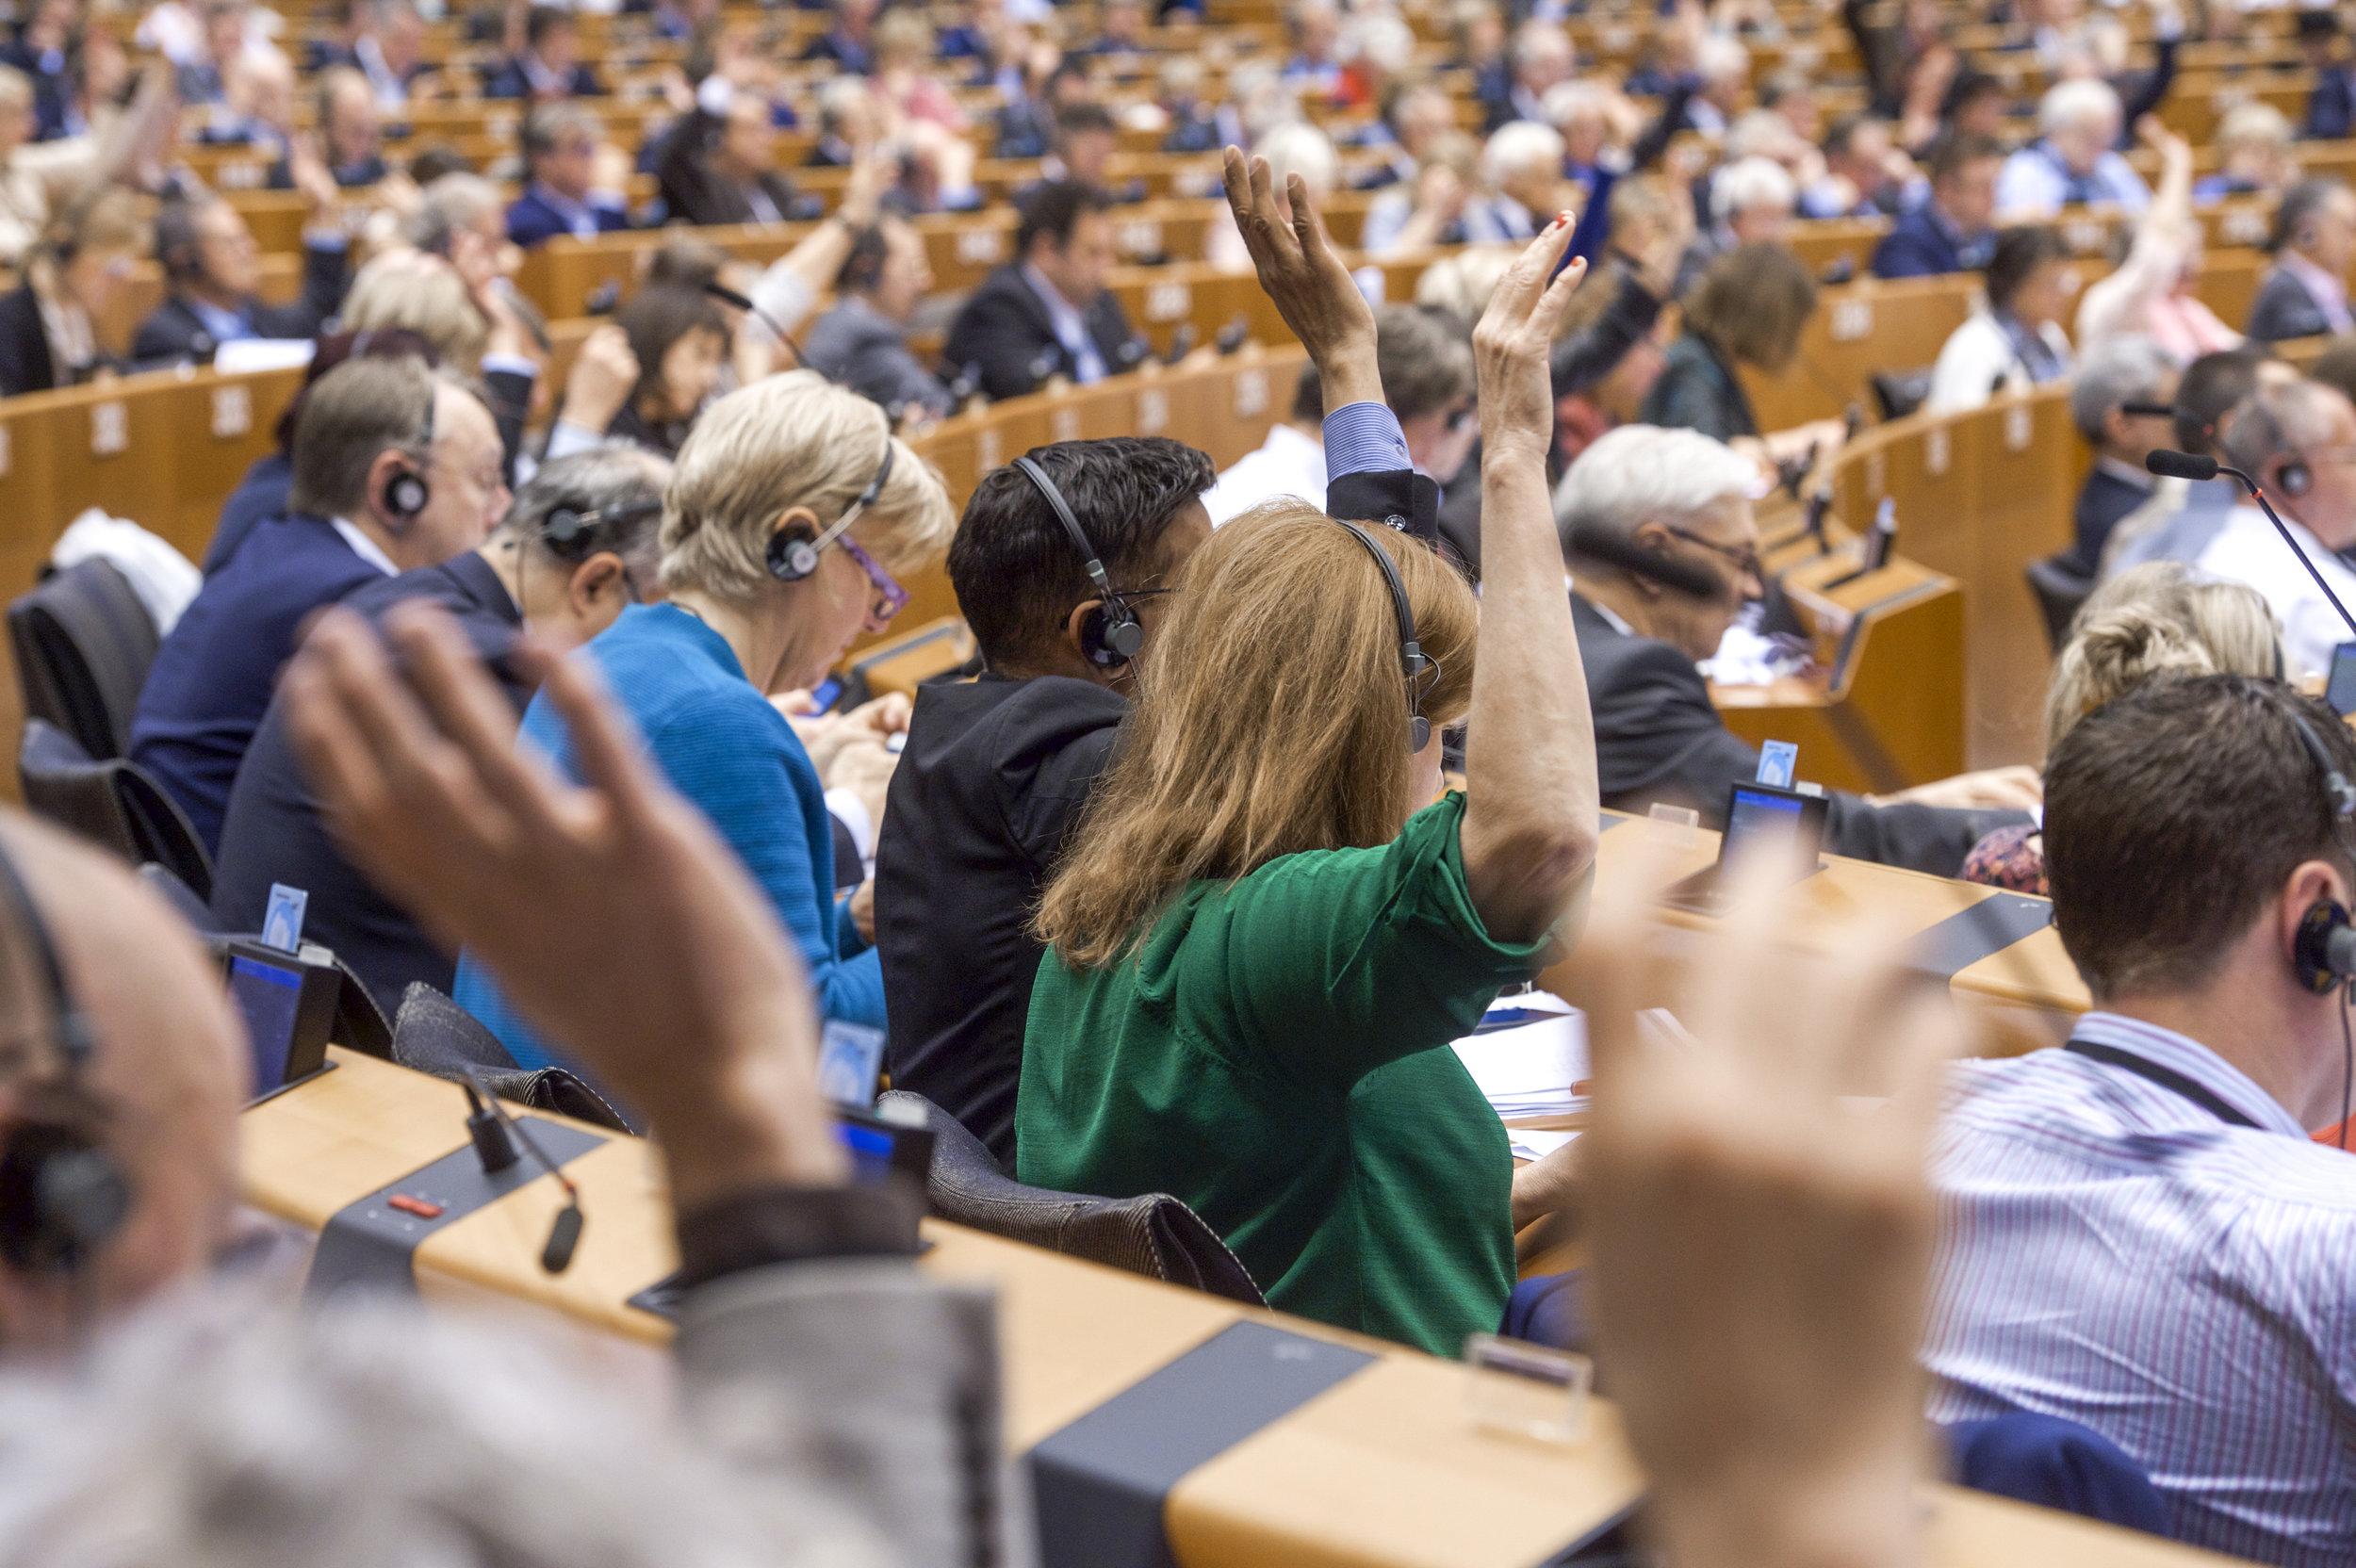 Foto: Jan VAN DE VEL, European Union 2019, vir: EP